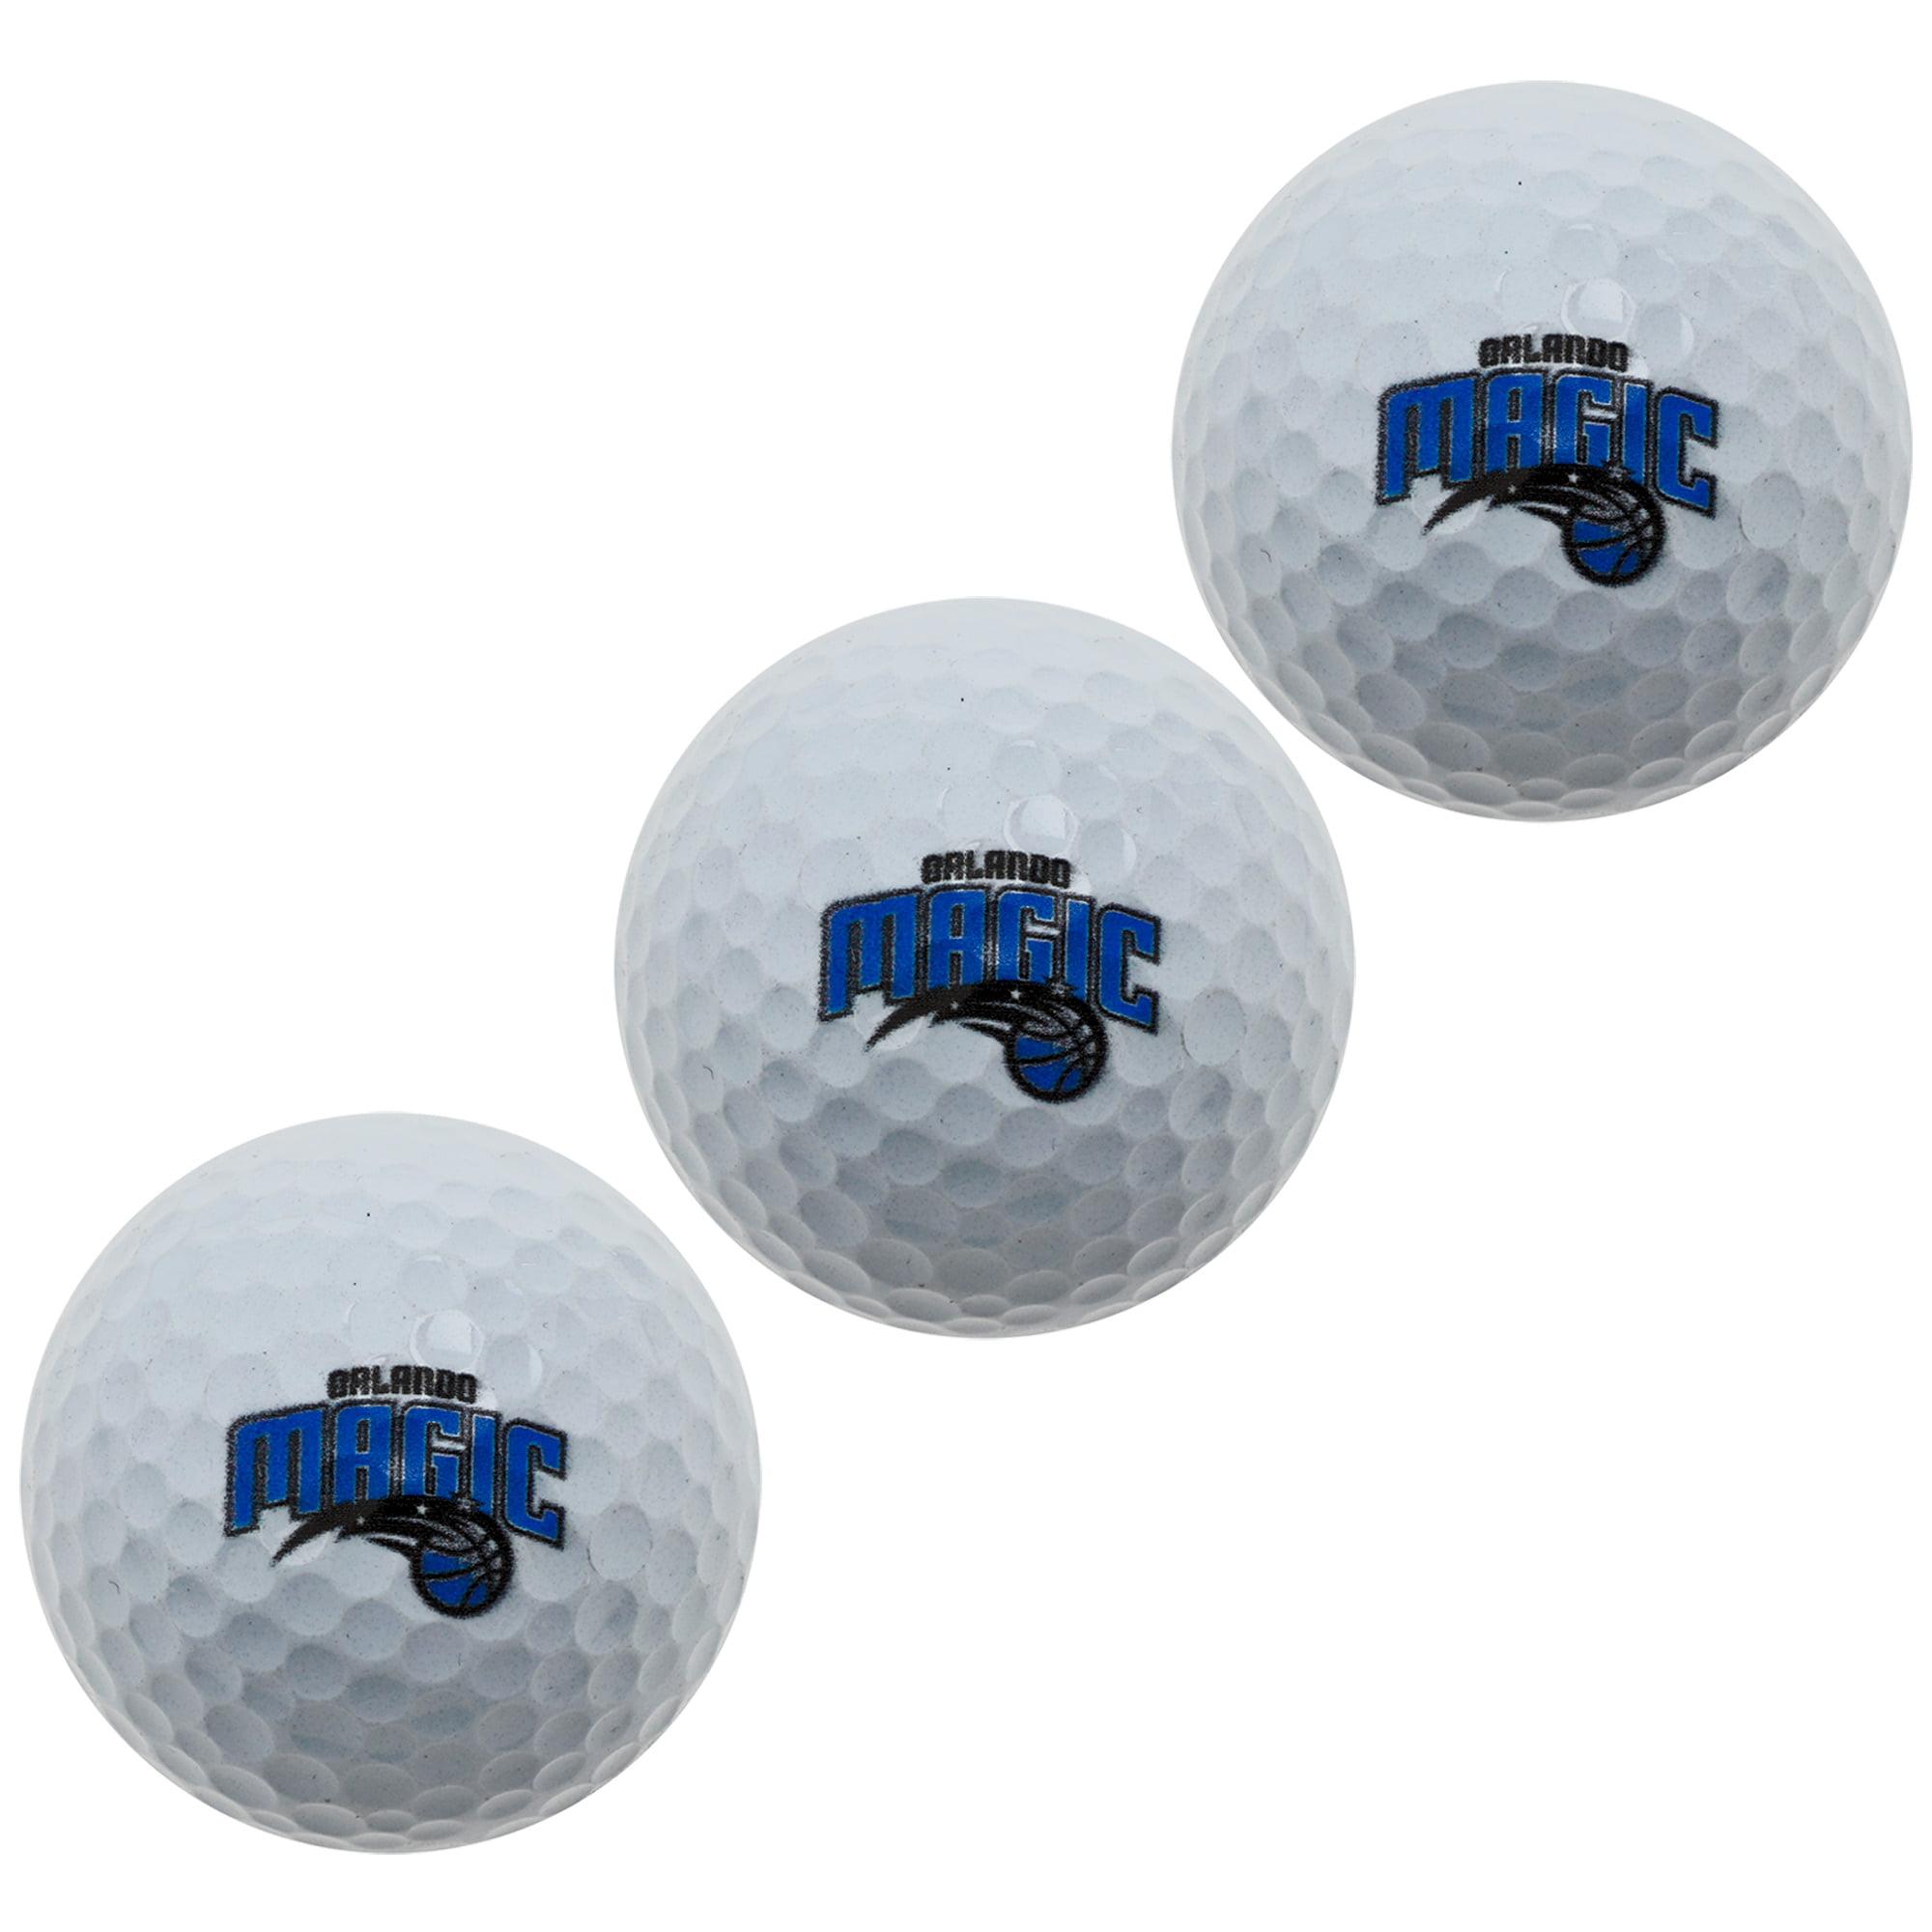 Orlando Magic WinCraft 3-Pack Golf Balls - No Size